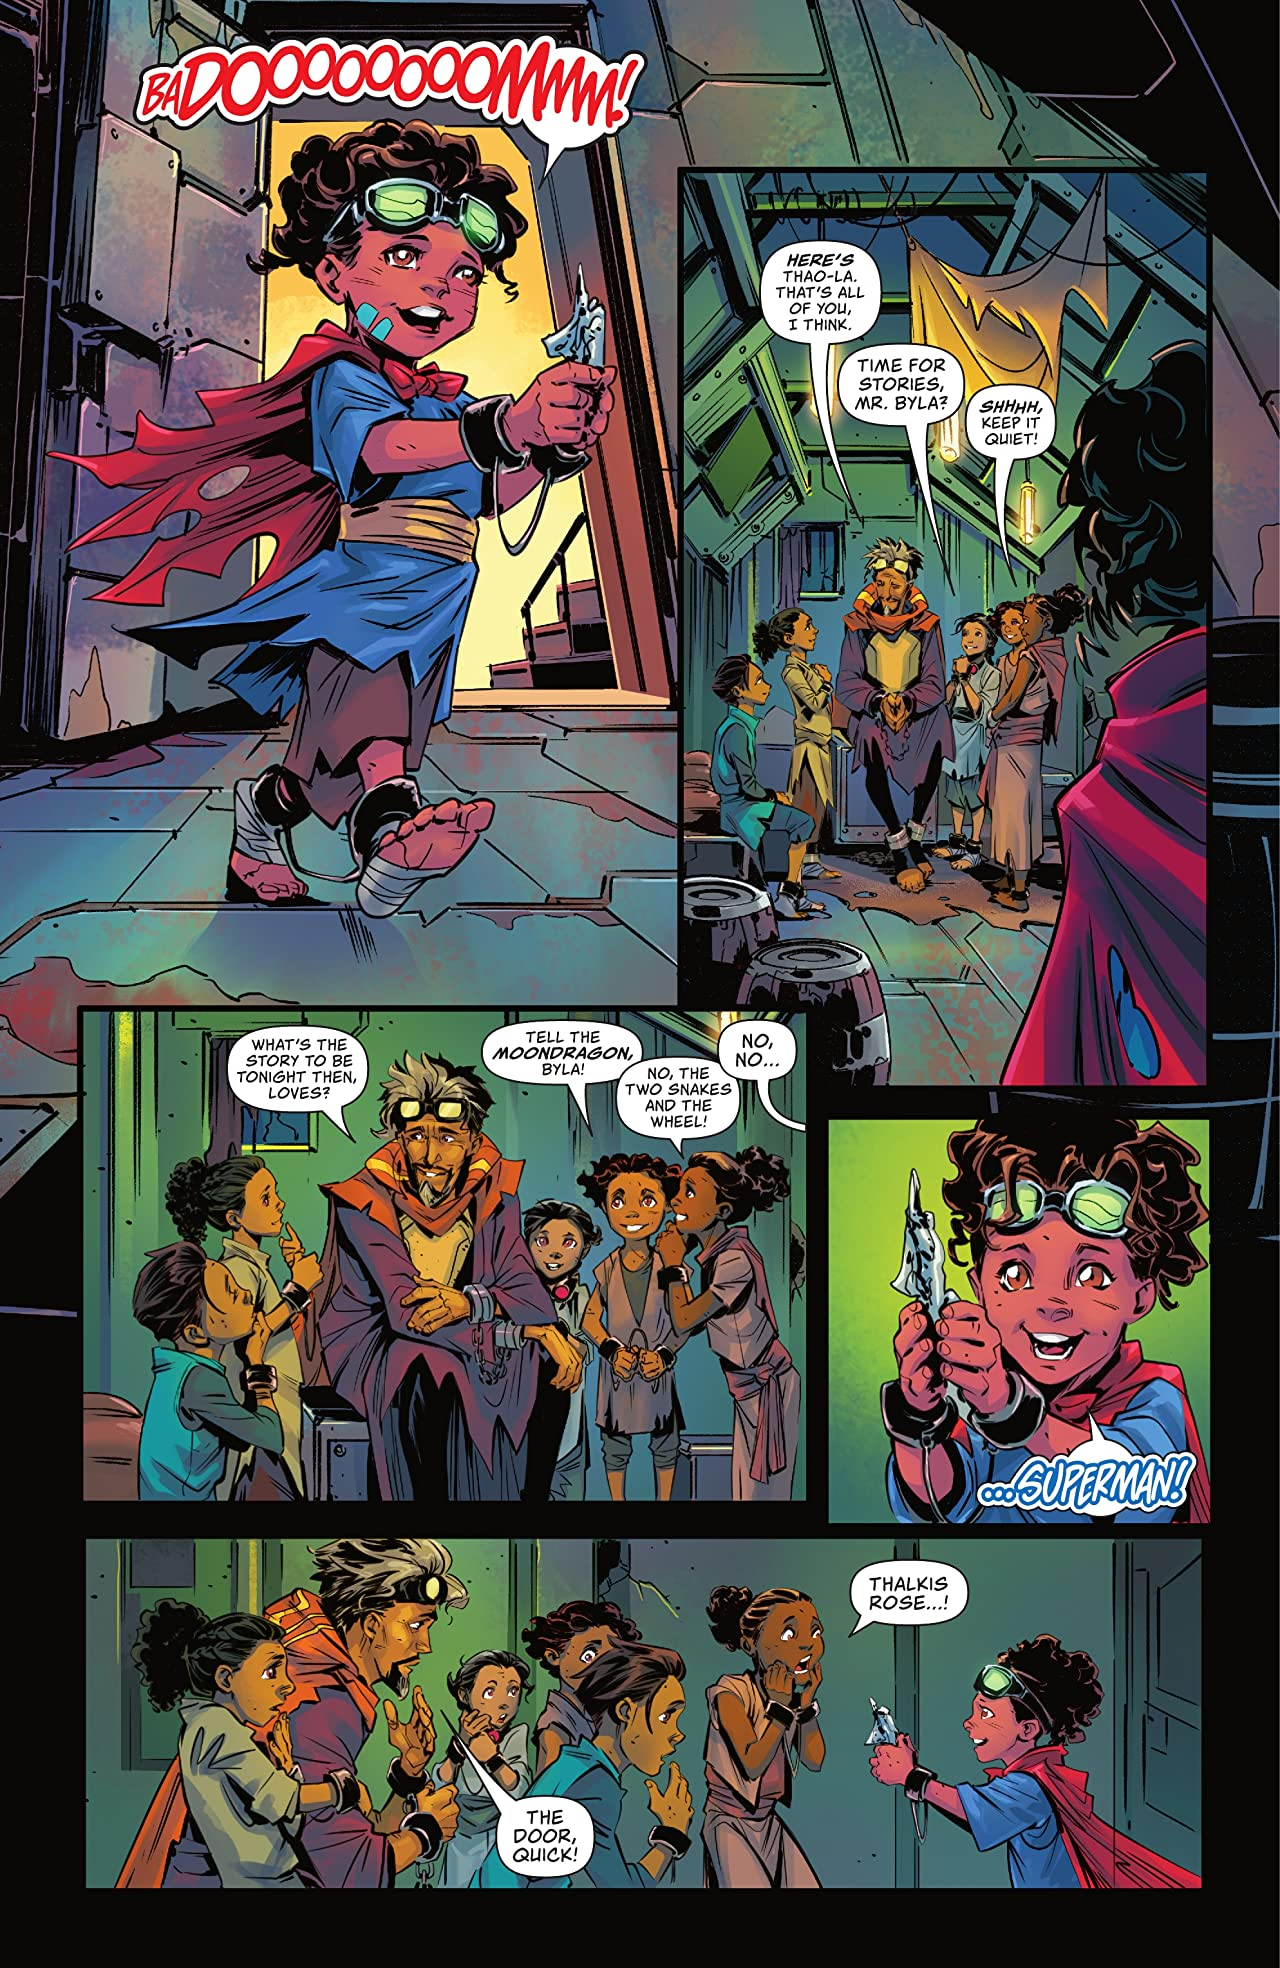 Action Comics 2021 Annual (2021) #1